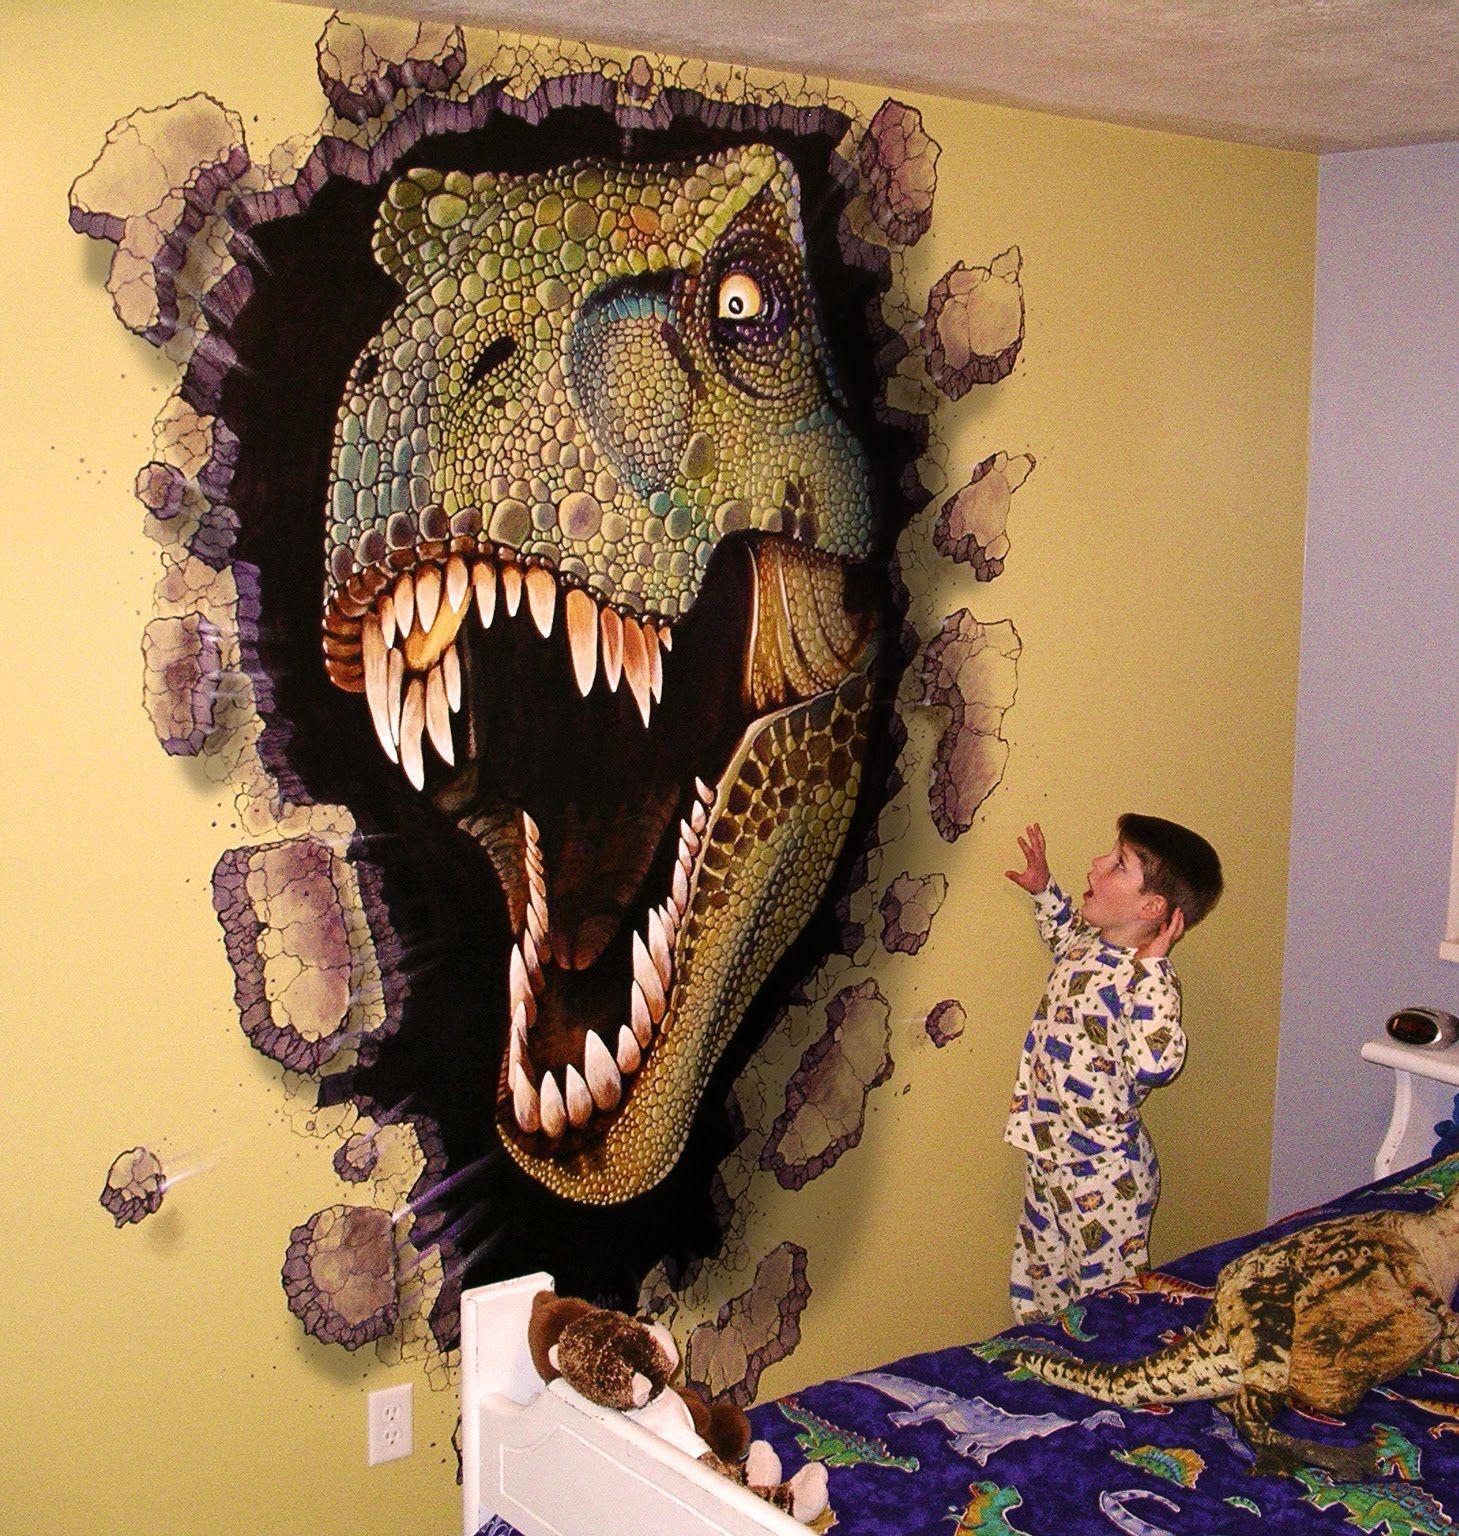 Boys Dinosaur Room | Miles Woods Art: Wall Murals | Painting ...